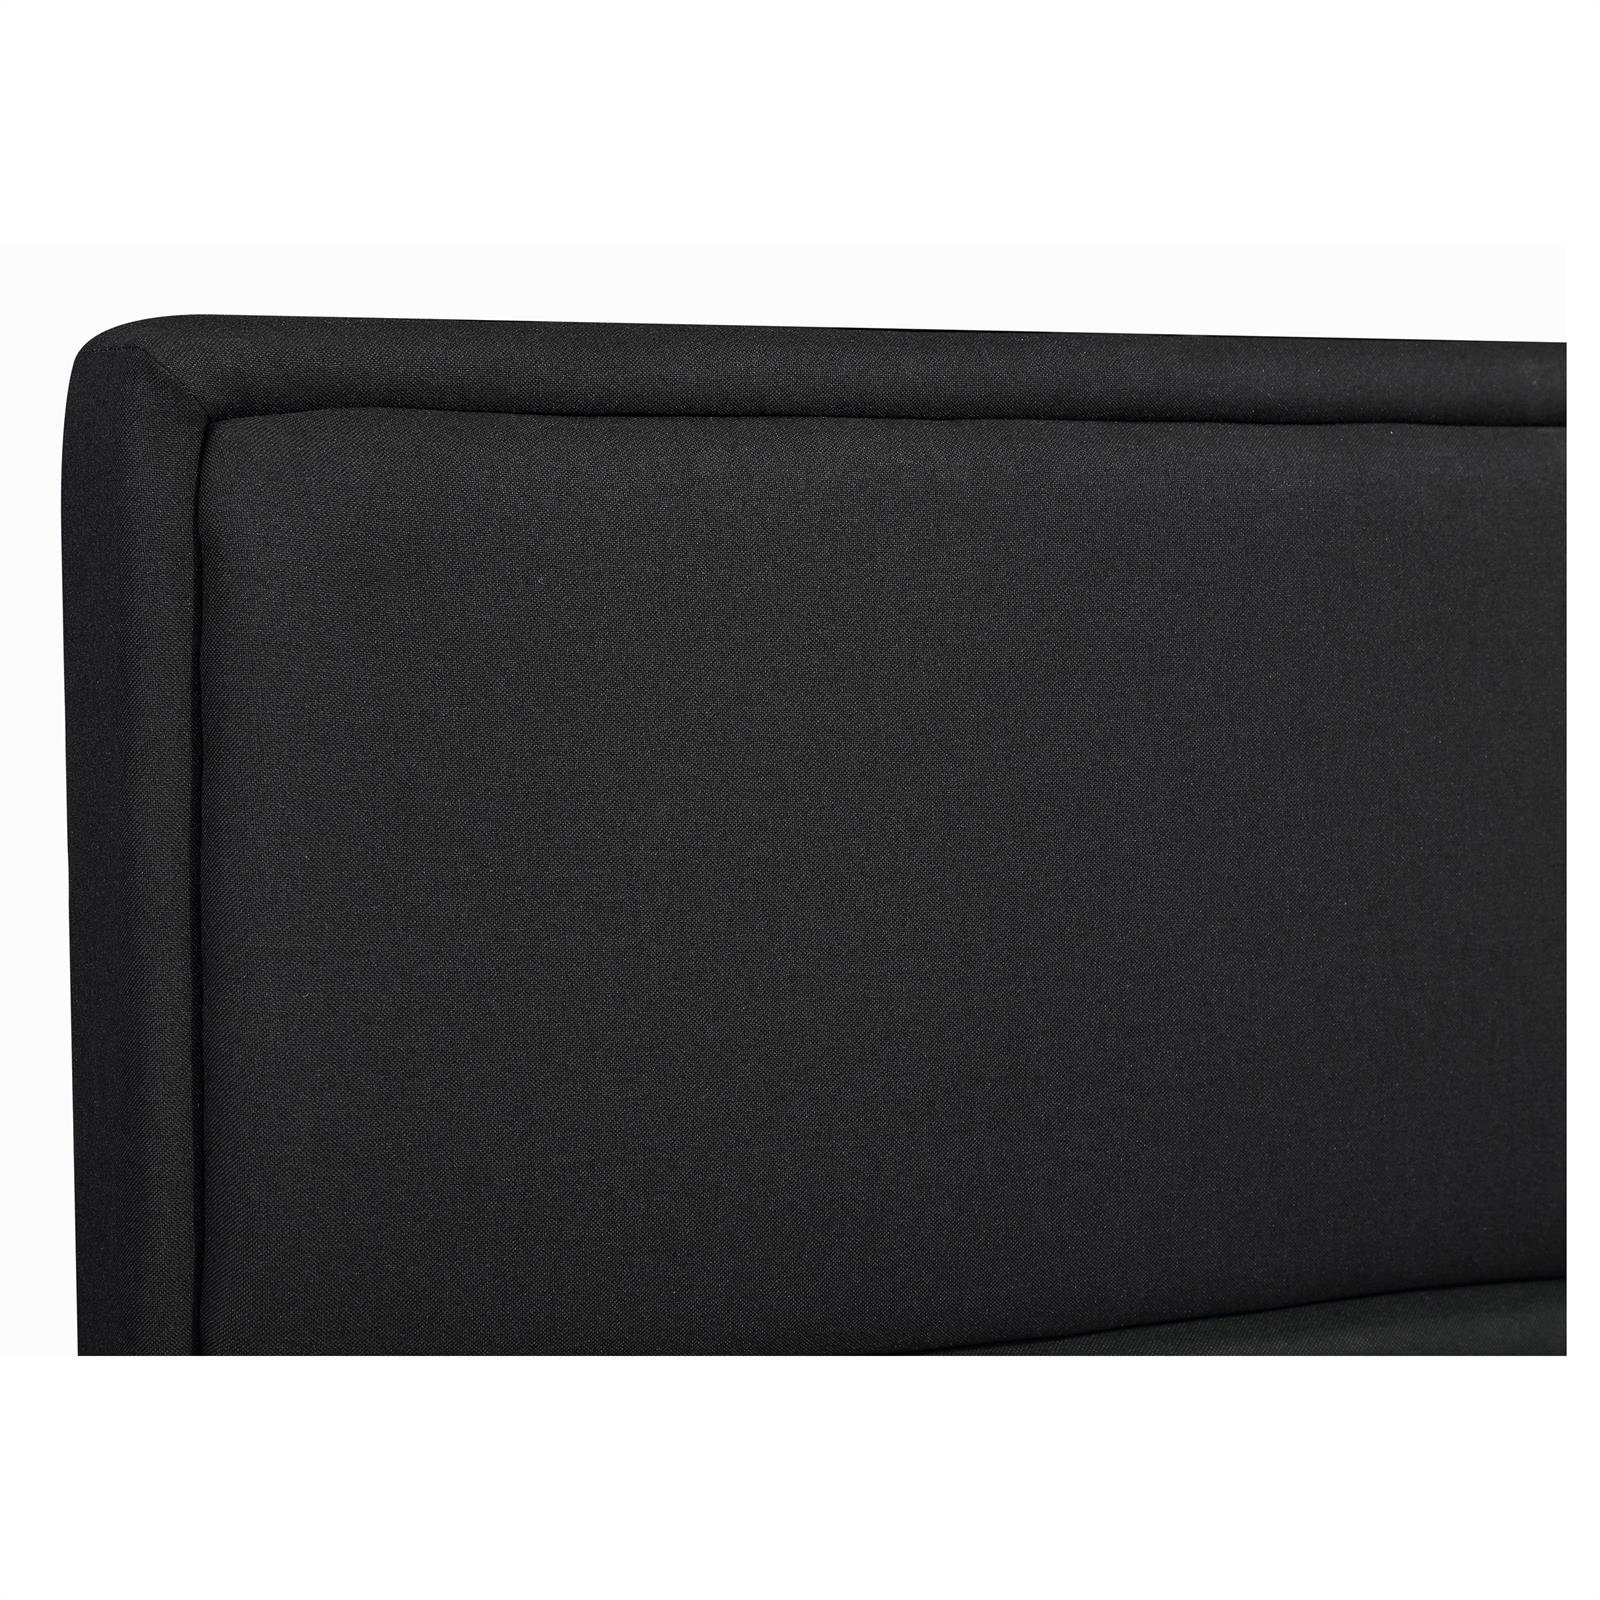 polsterbett anais 140x200 cm inkl rollrost schwarz caro m bel. Black Bedroom Furniture Sets. Home Design Ideas